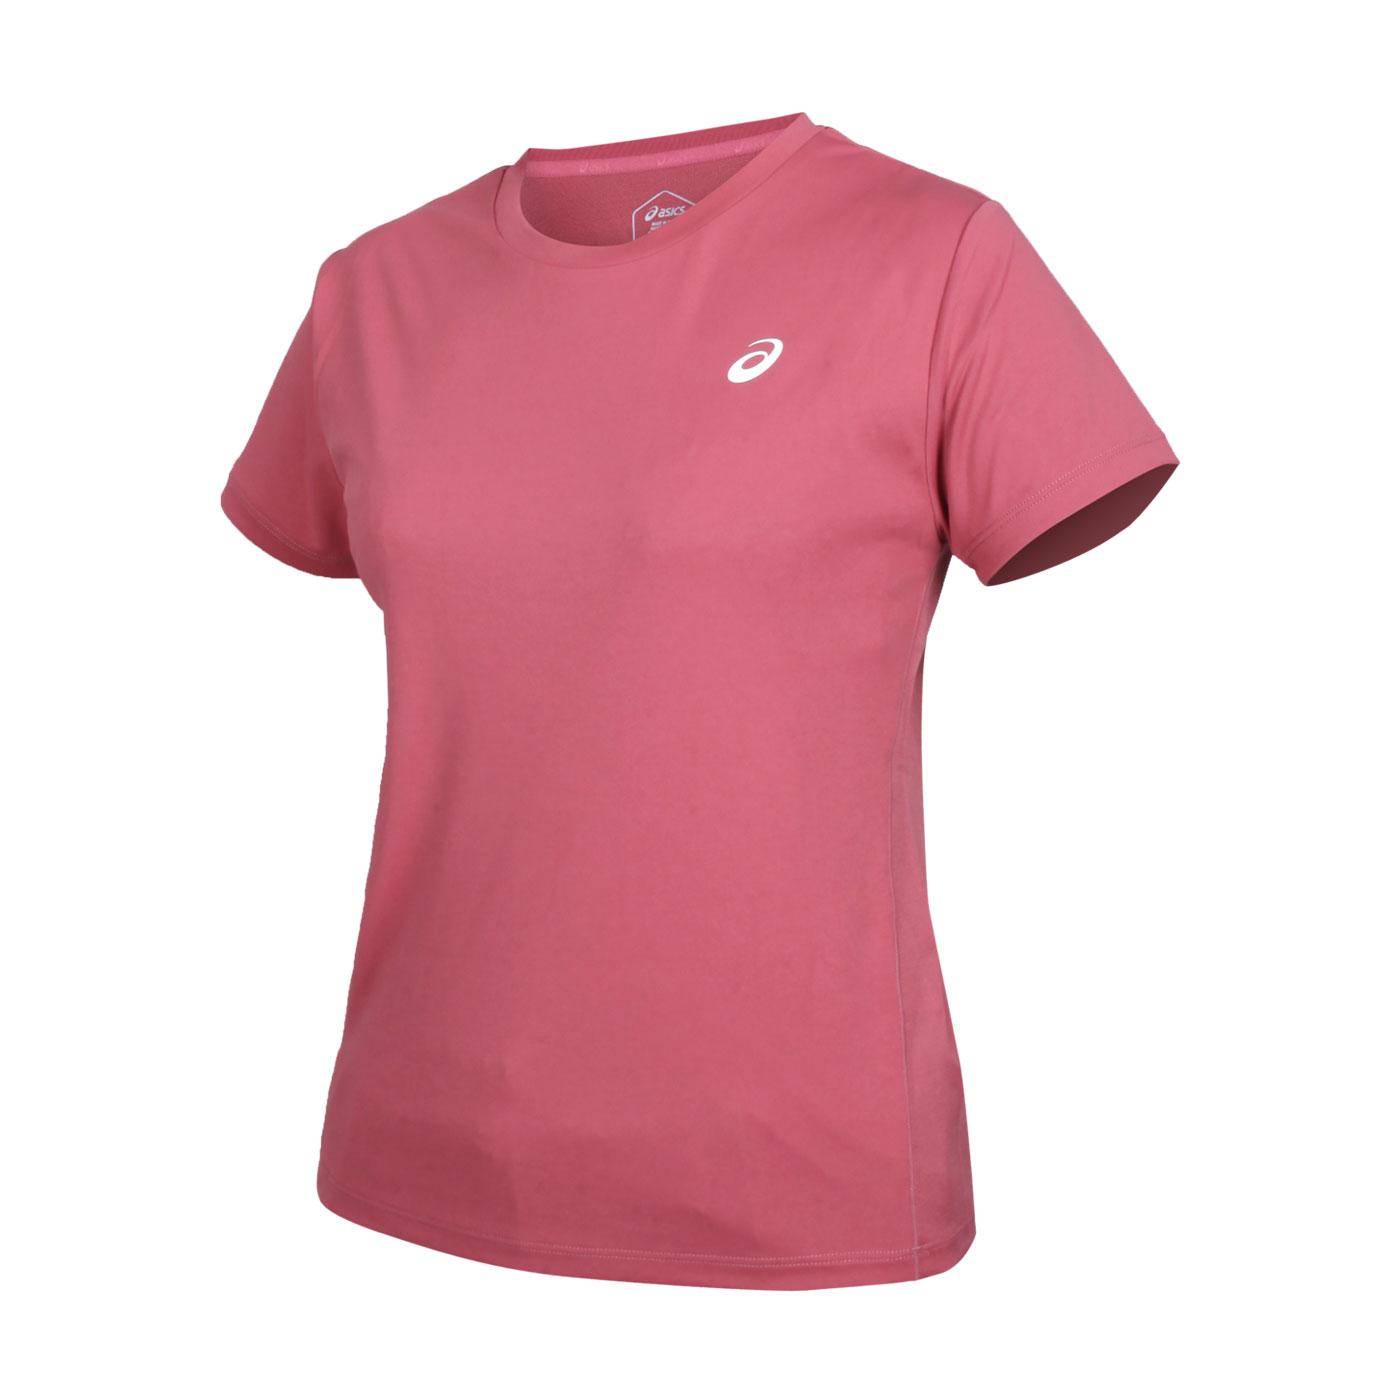 ASICS 女款短袖T恤 2012C256-700